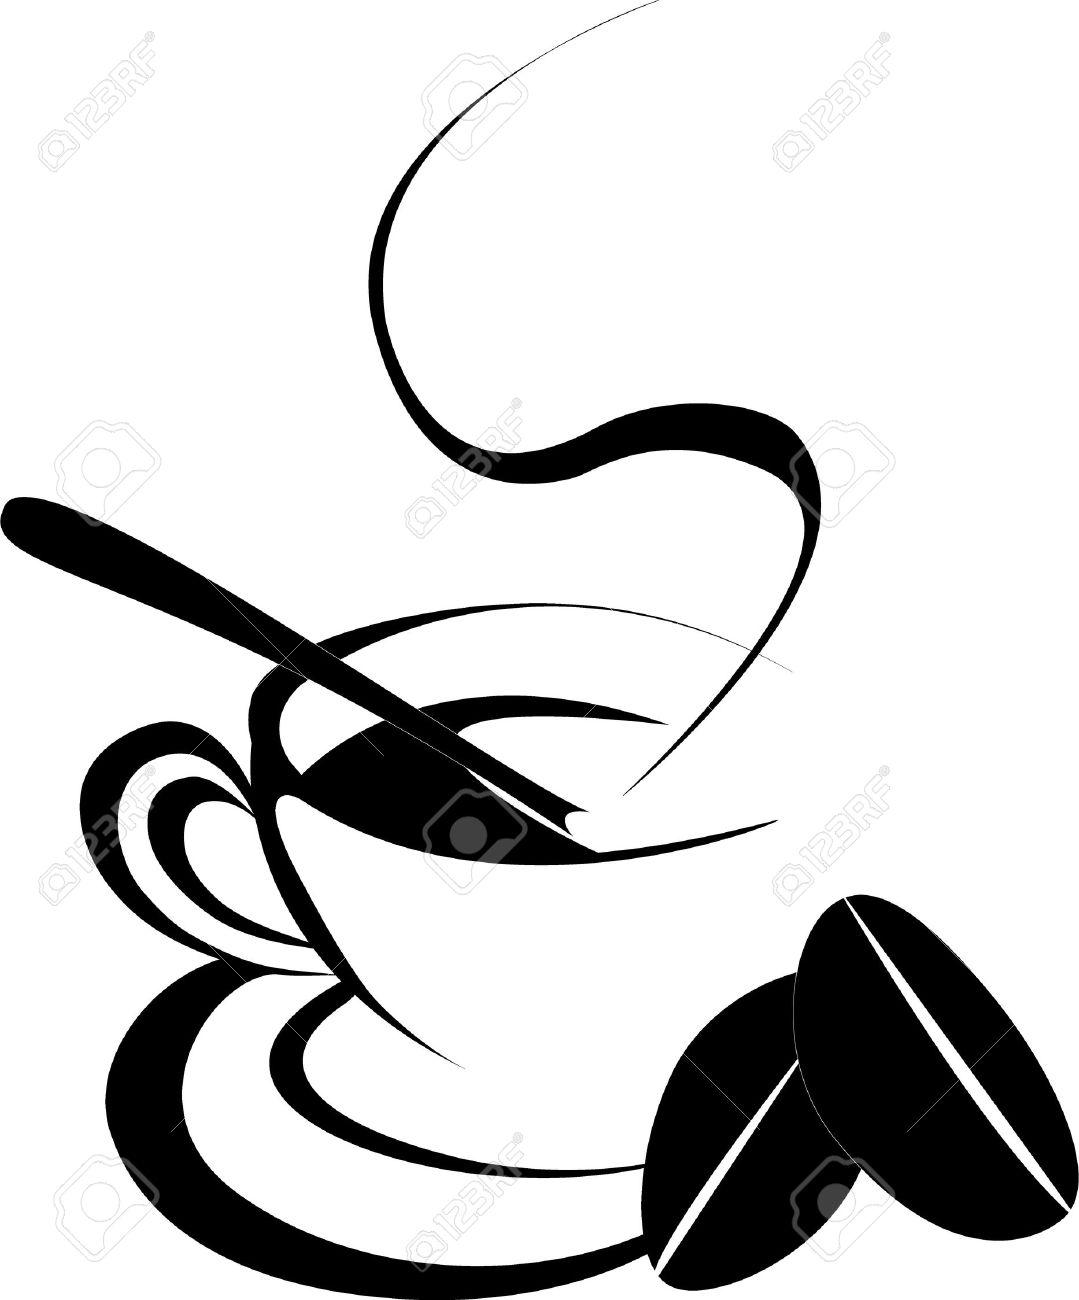 Coffee Pot Silhouette